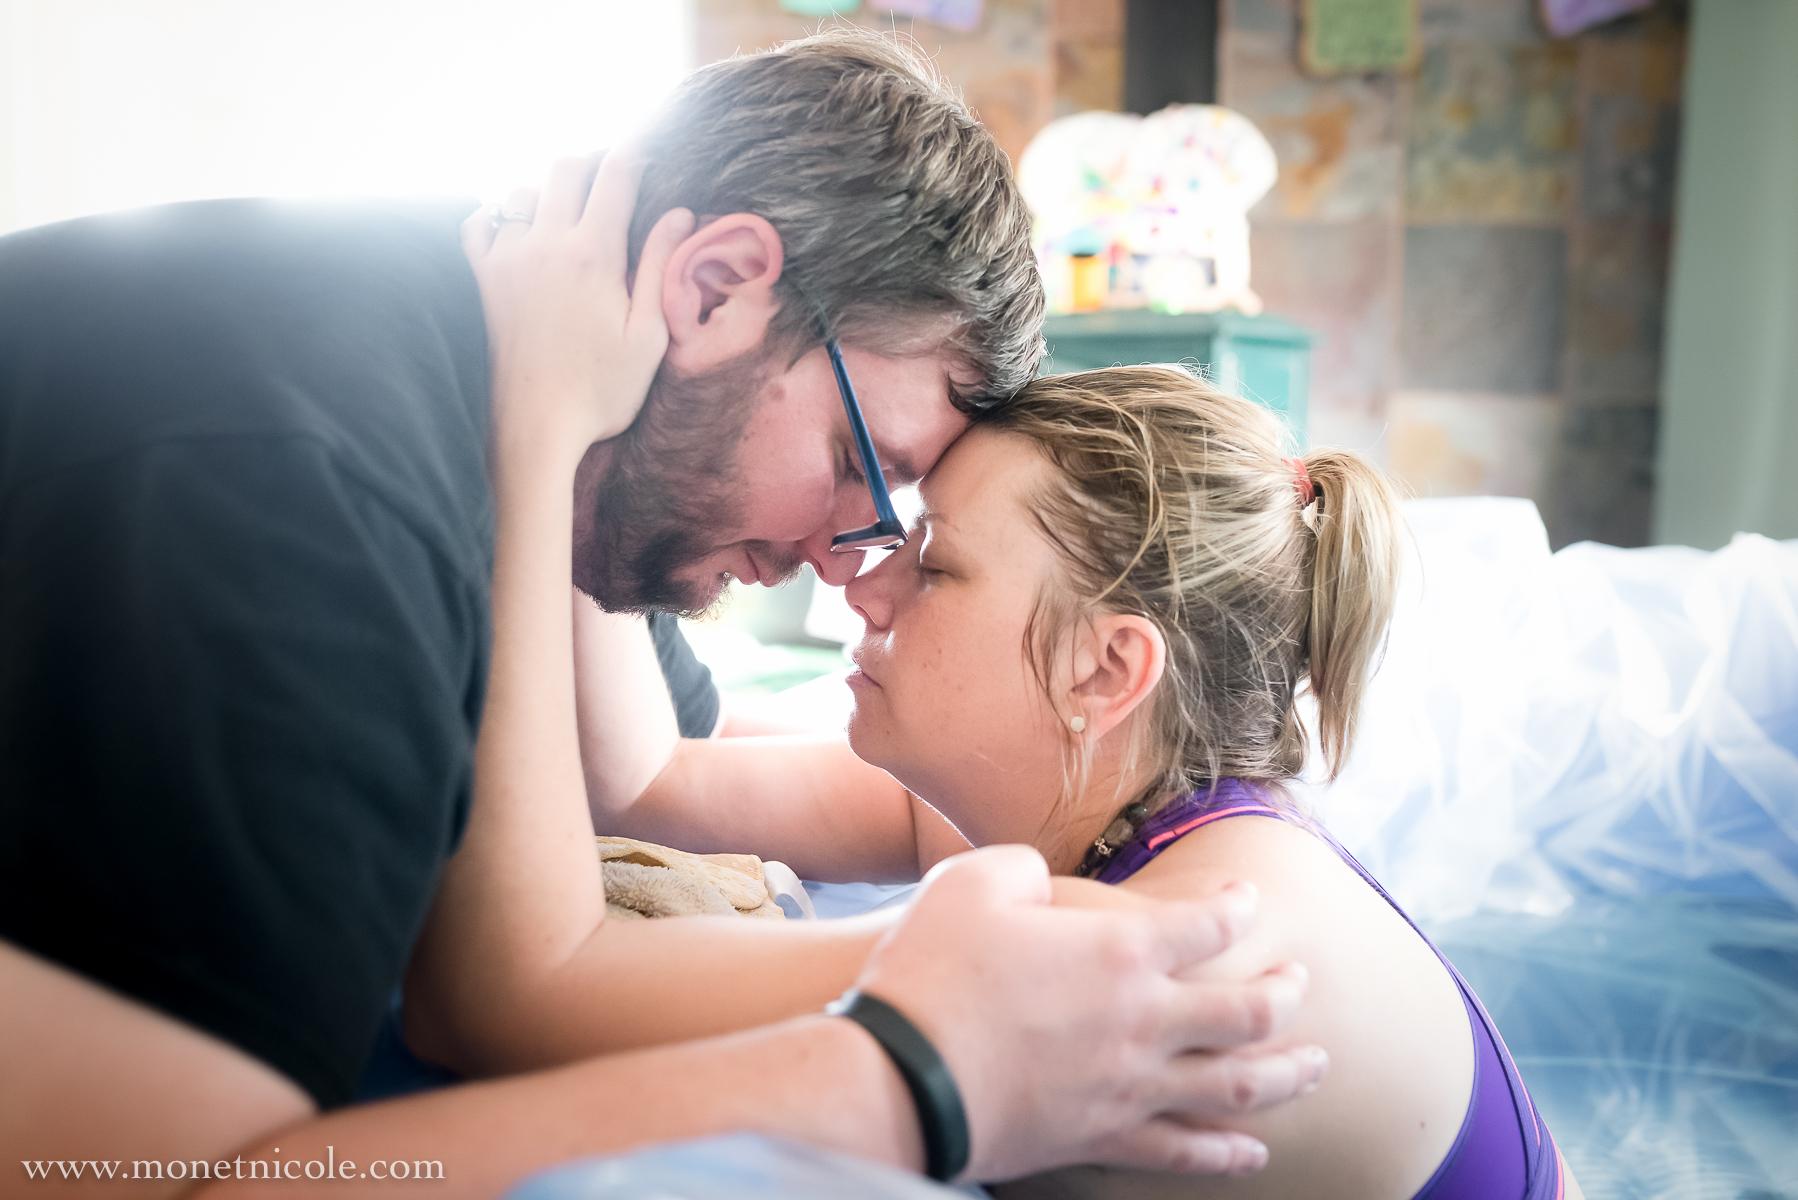 denver-homebirth-photography-love-support